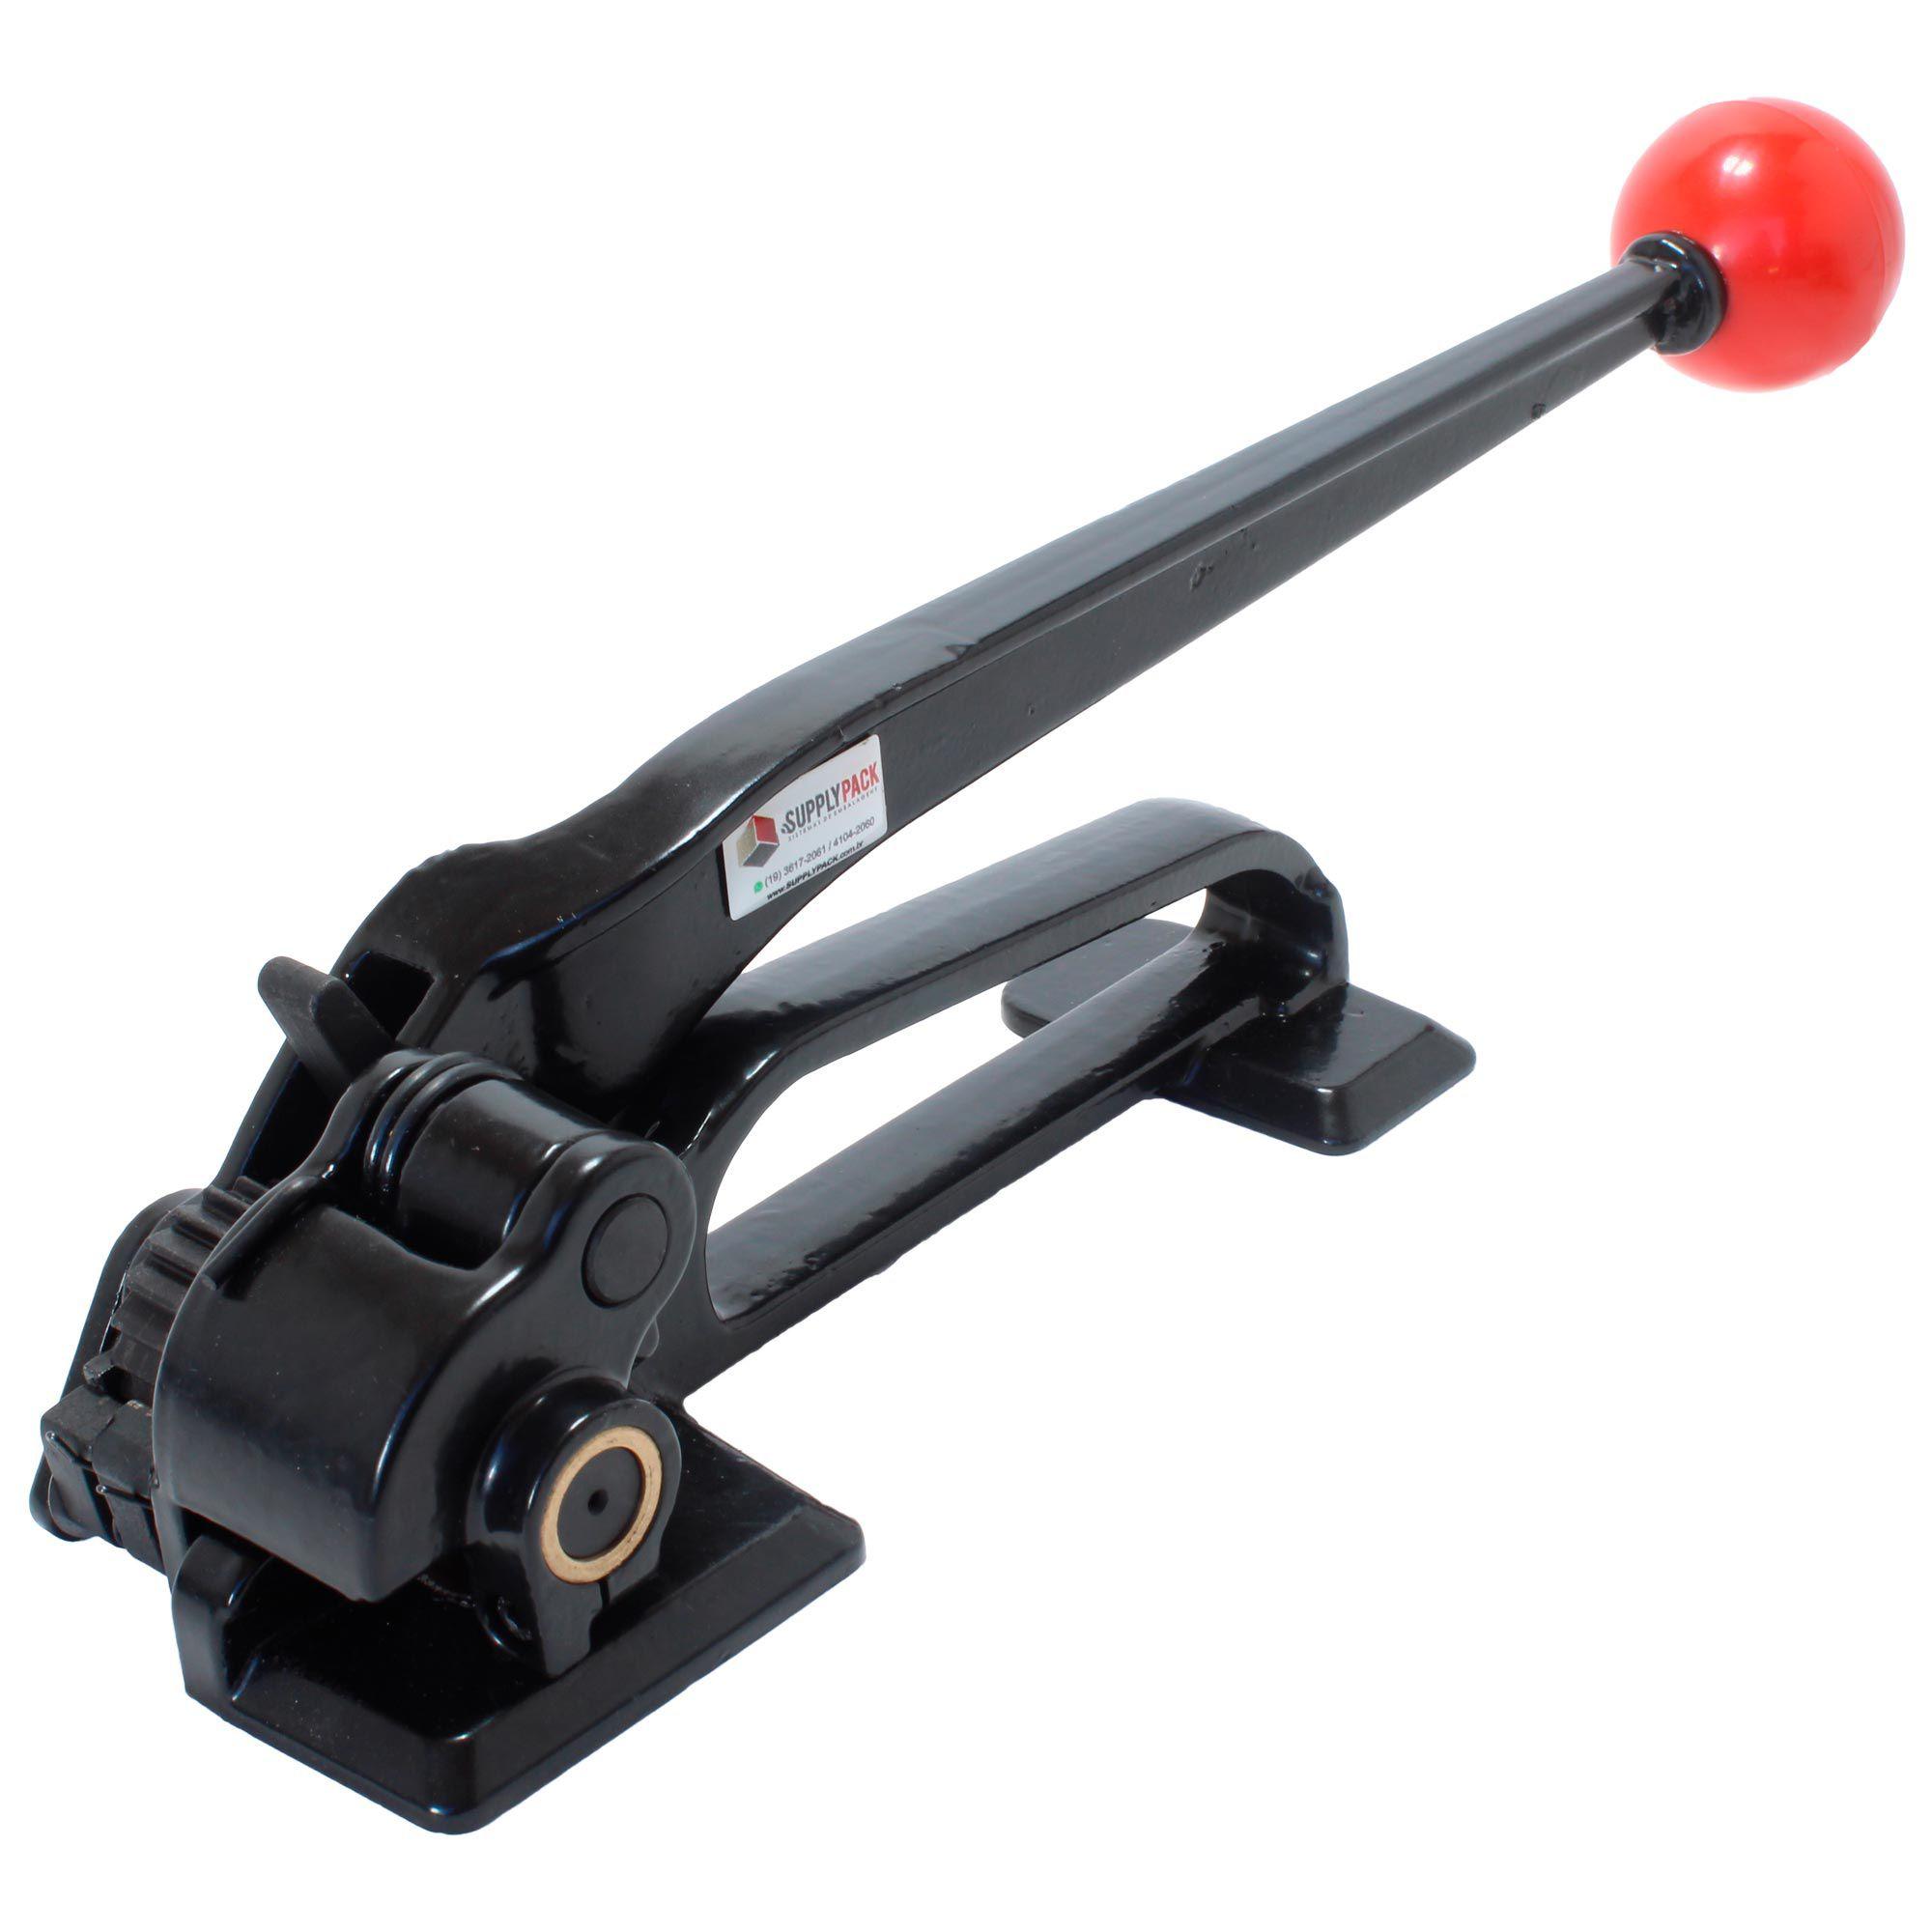 Esticador Tensionador para Fita de Aco de 12 a 19mm Supplypack